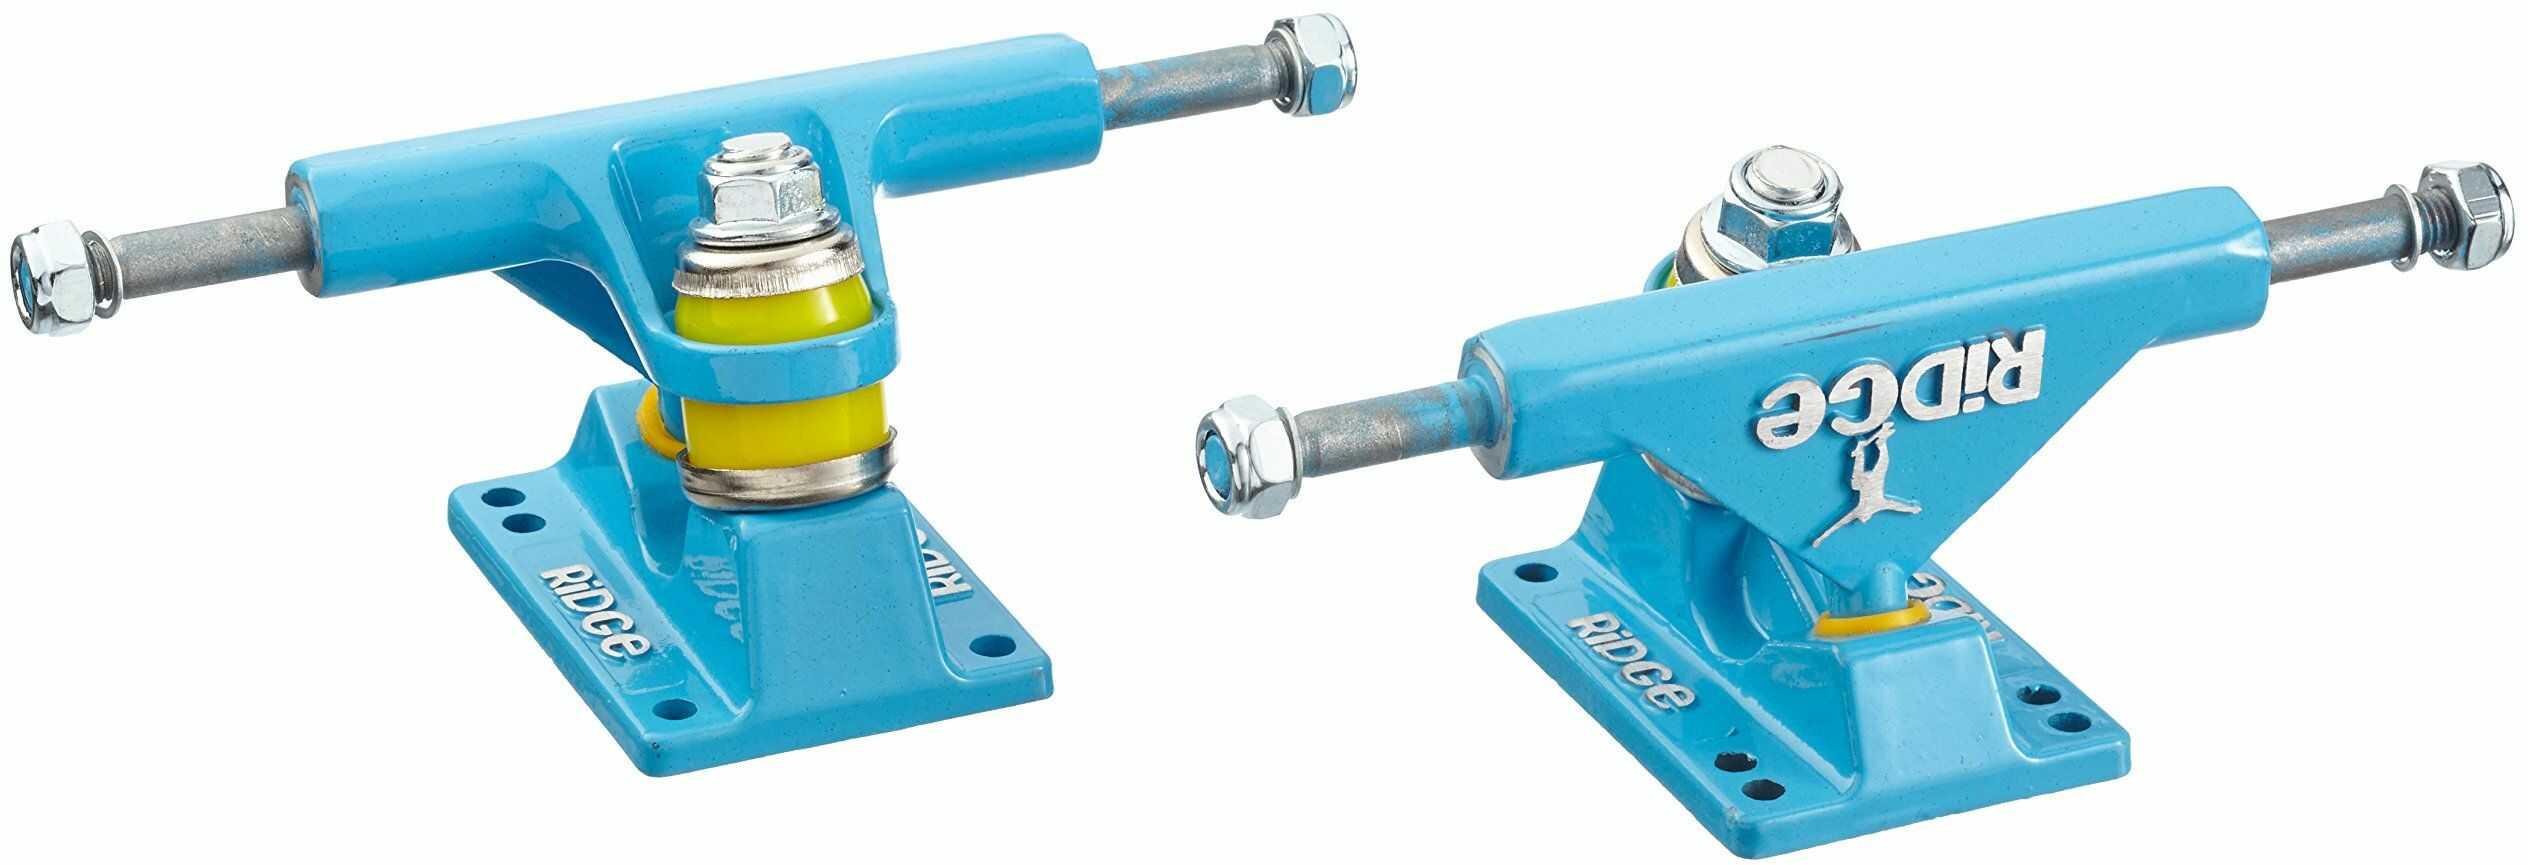 Ridge Skateboards Unisex 27 Trucks deskorolkowe dla Big Brother Cruiser-Blue, 10 cm, 10-68 cm